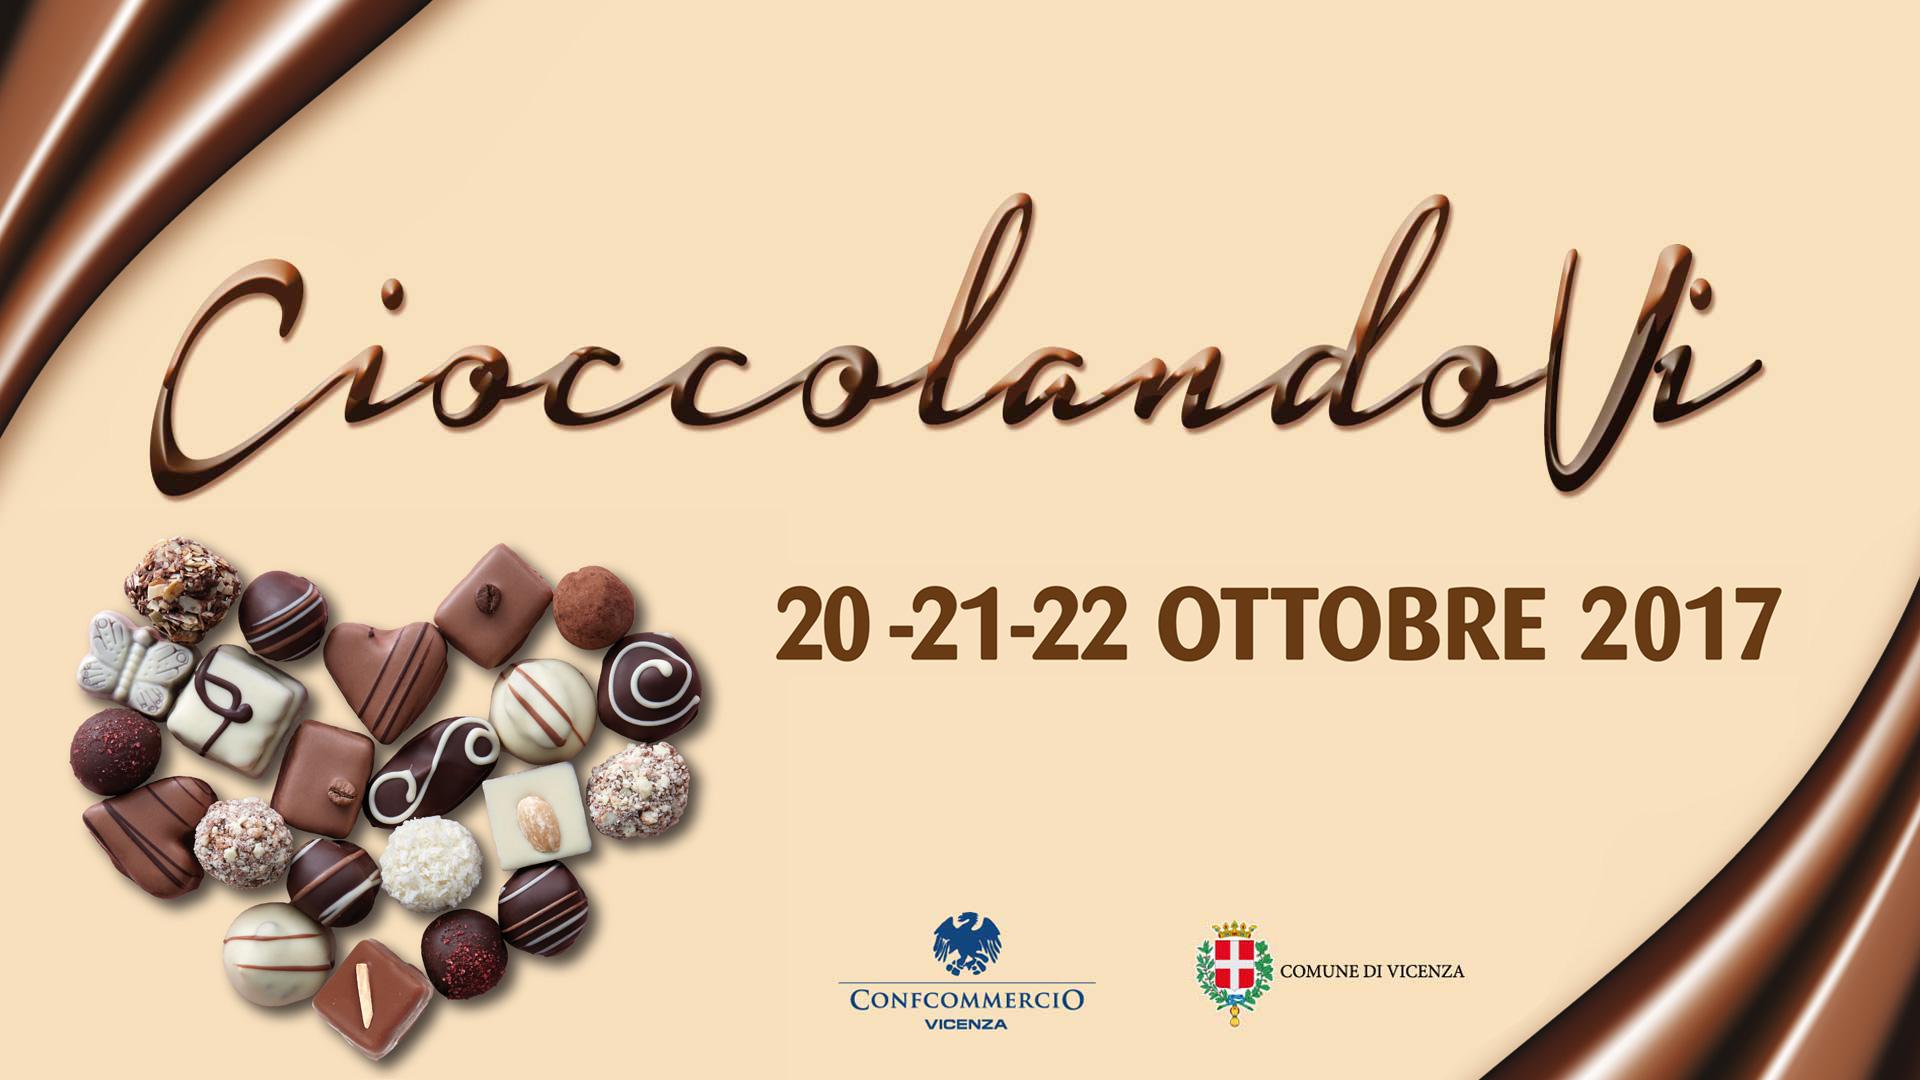 Cioccolandovi Vicenza 2017